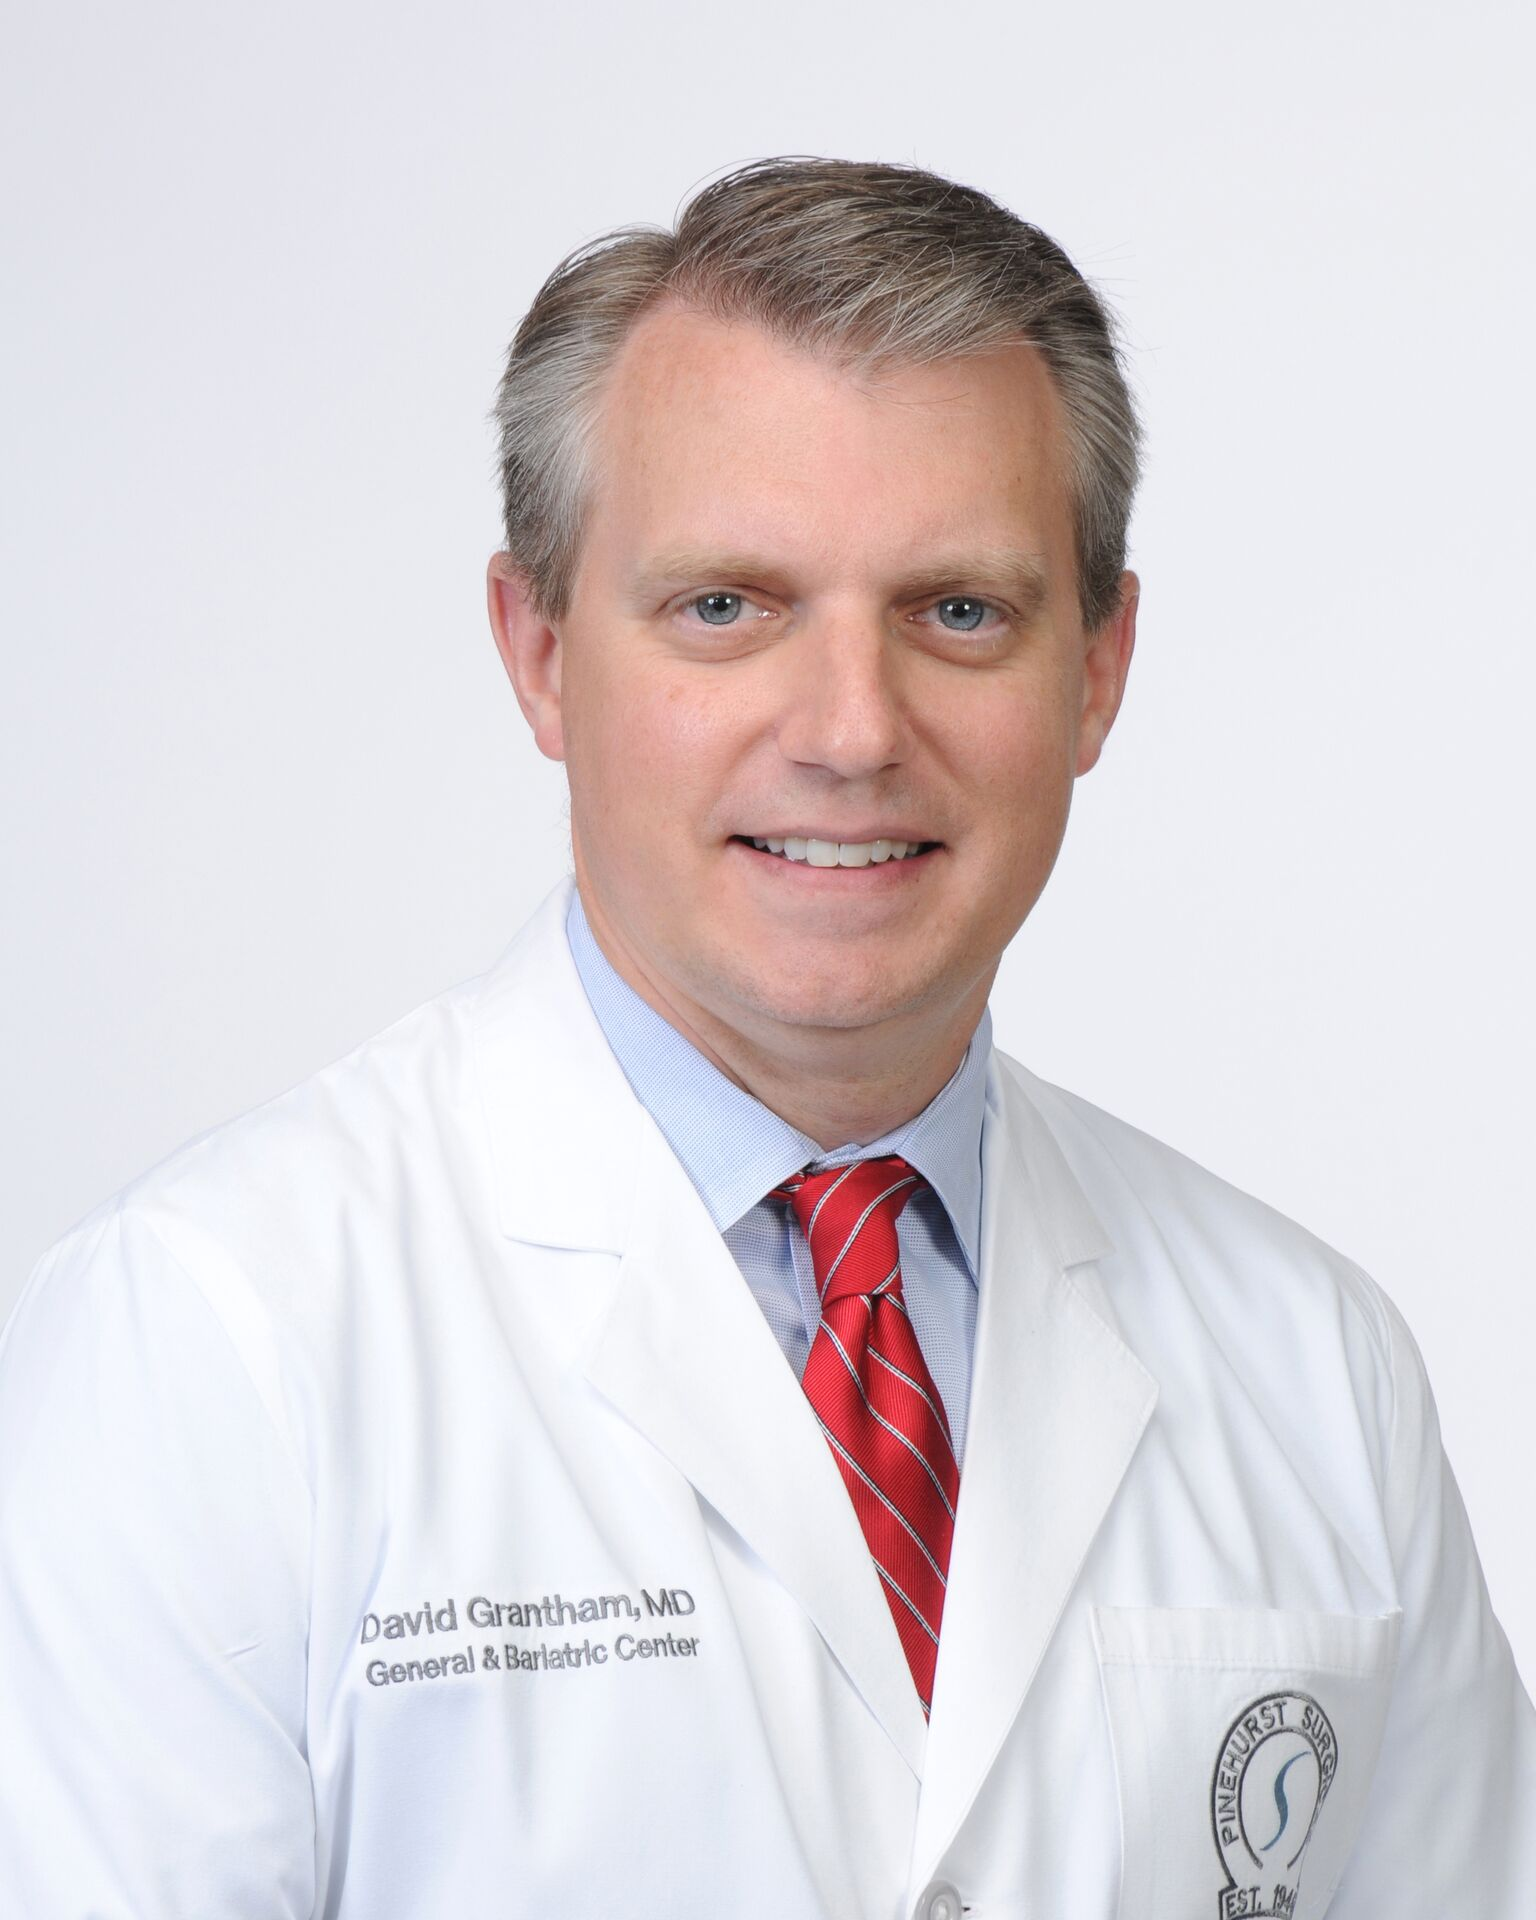 David Grantham General & Bariatric Surgery